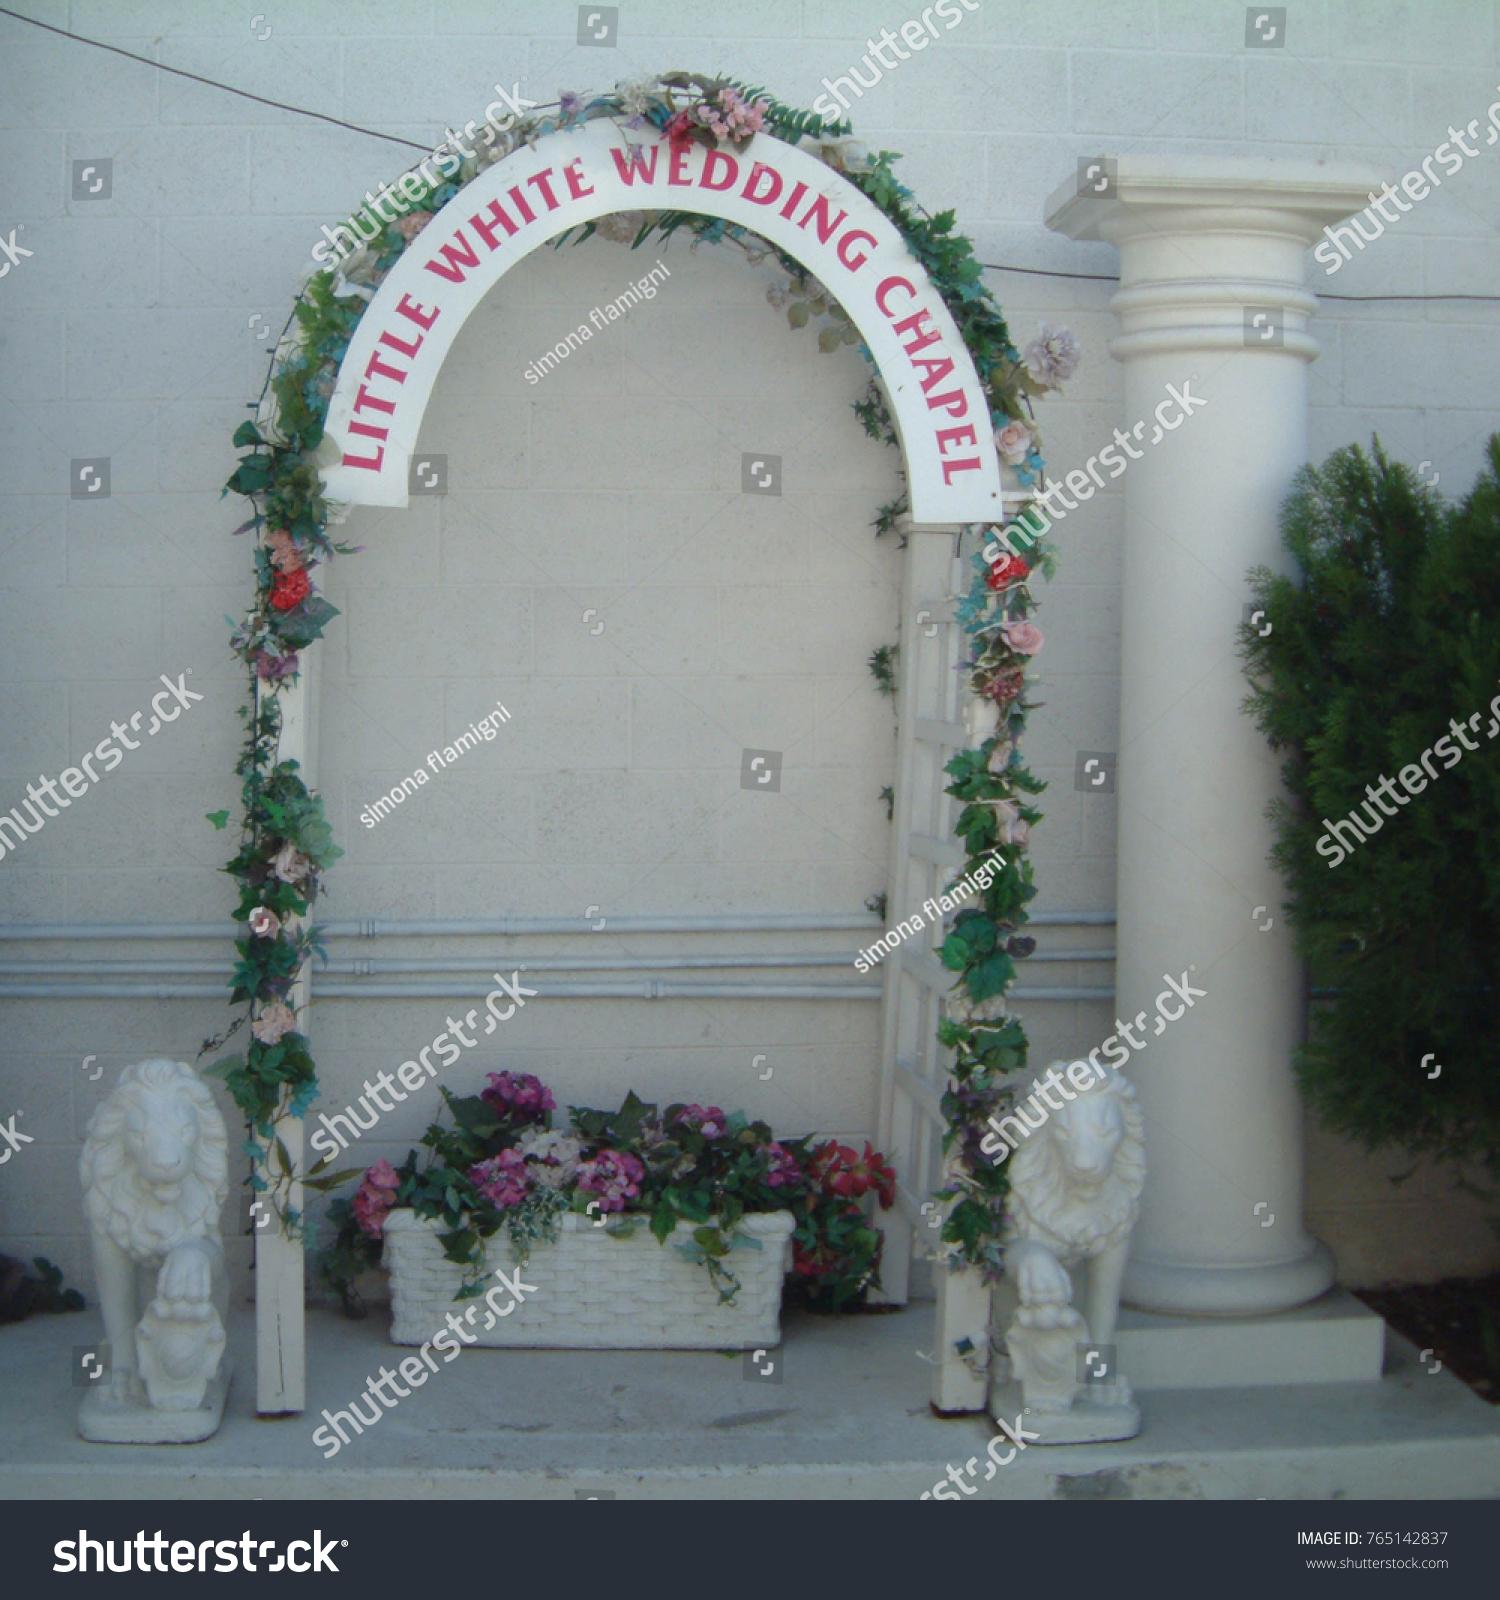 Las vegas united states march 31 stock photo edit now 765142837 las vegas united states march 31 2003 a little white wedding chapel mightylinksfo